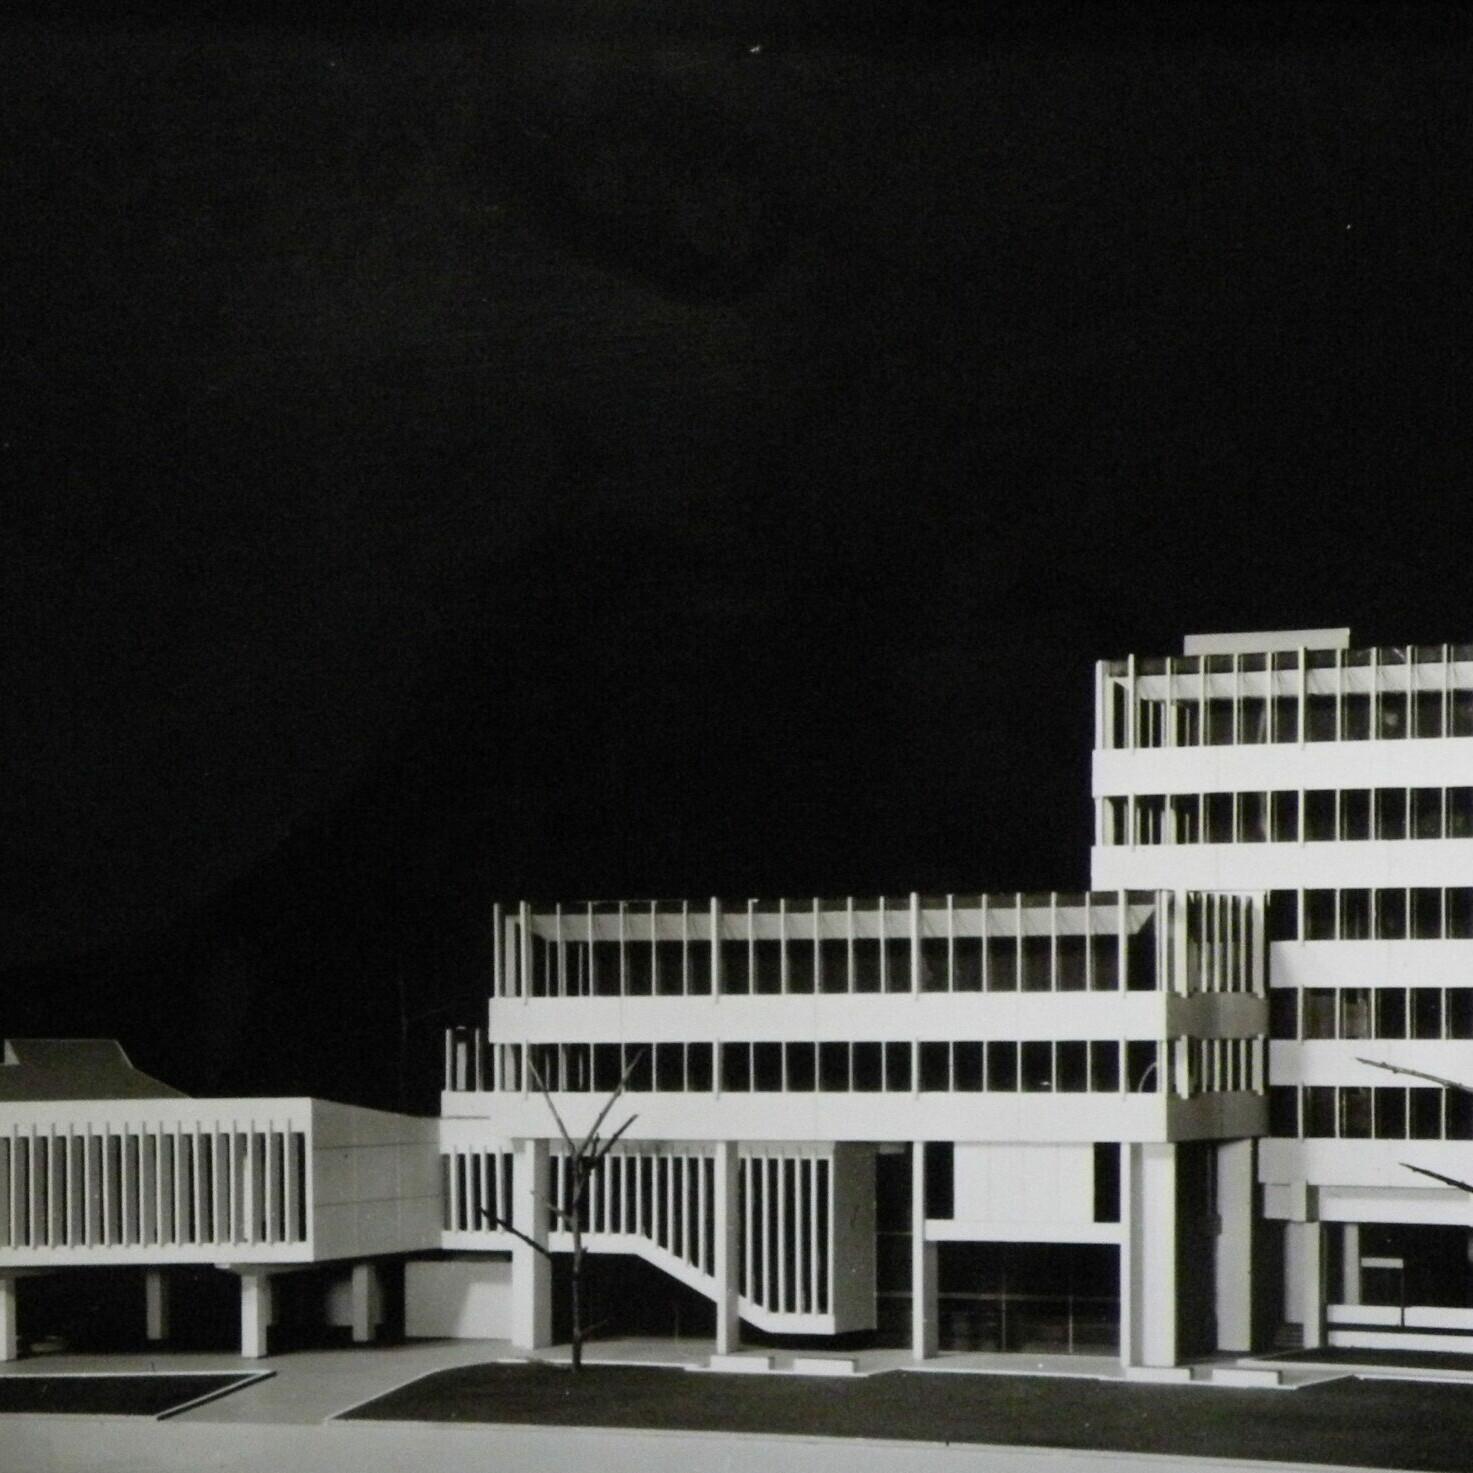 Rathaus Greven (1971-73, Dieter Oesterlen), Modell - Foto: Stefan Rethfeld